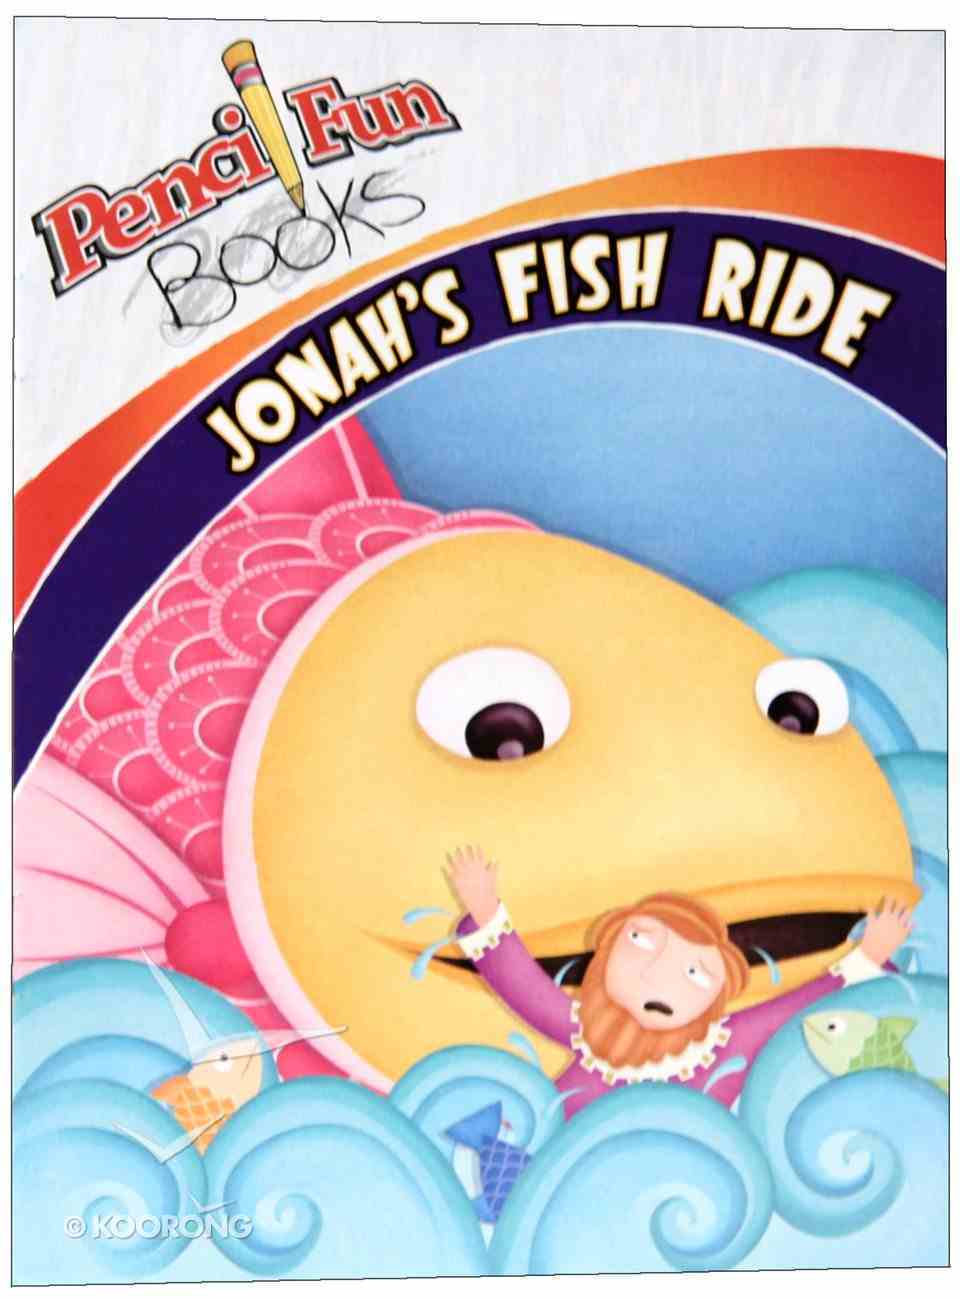 Jonah's Fish Ride (Pencil Fun Books Series) Paperback